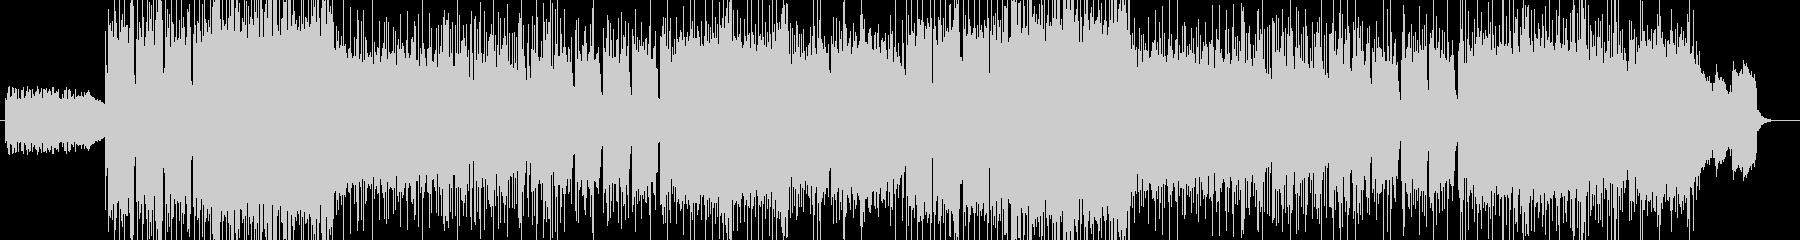 「HR/HM」「ROCK」BGM324の未再生の波形